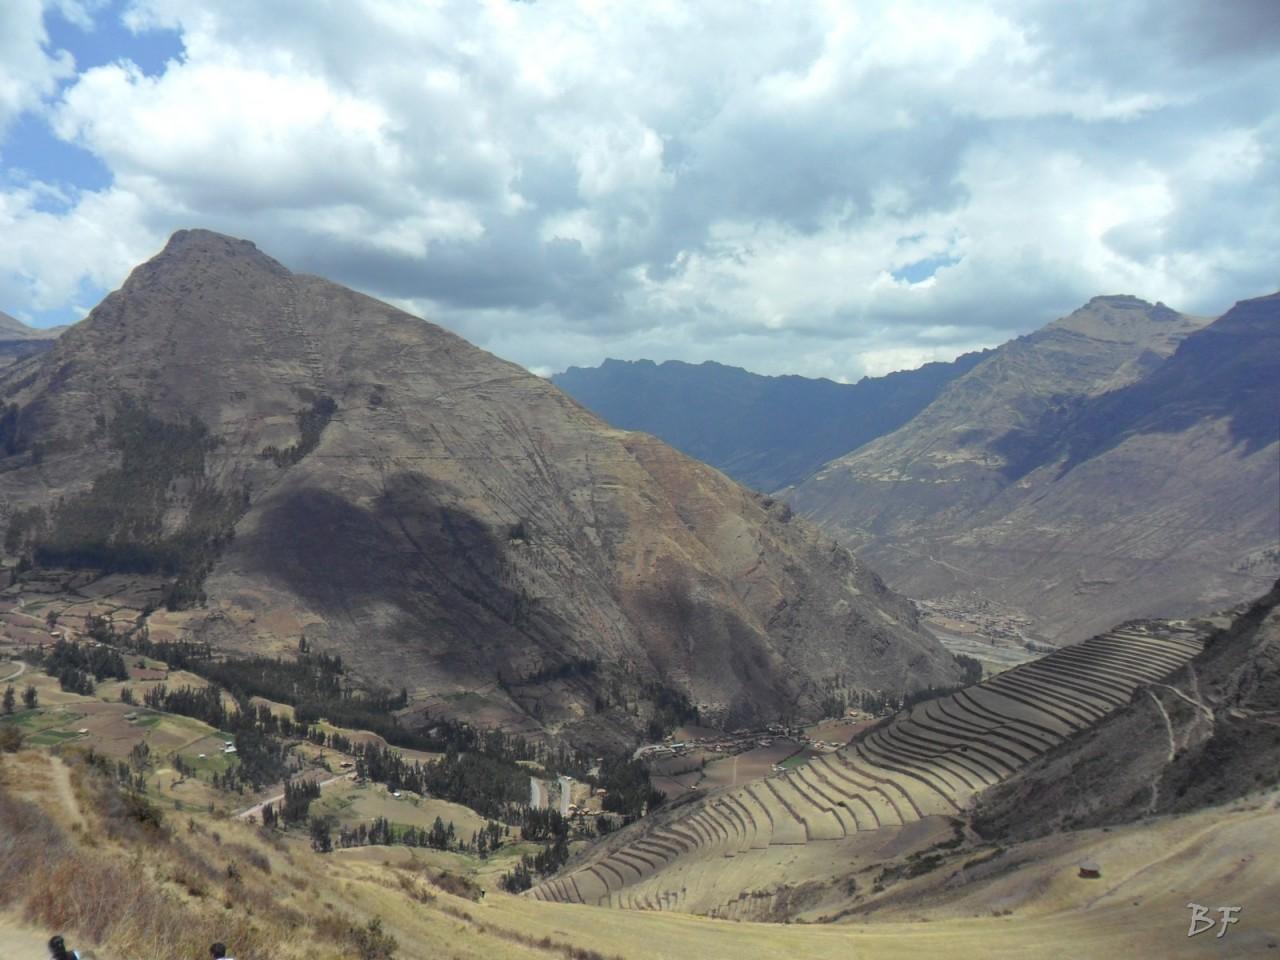 Mura-Poligonali-Megaliti-Altari-Rupestri-Pisac-Cusco-Perù-7